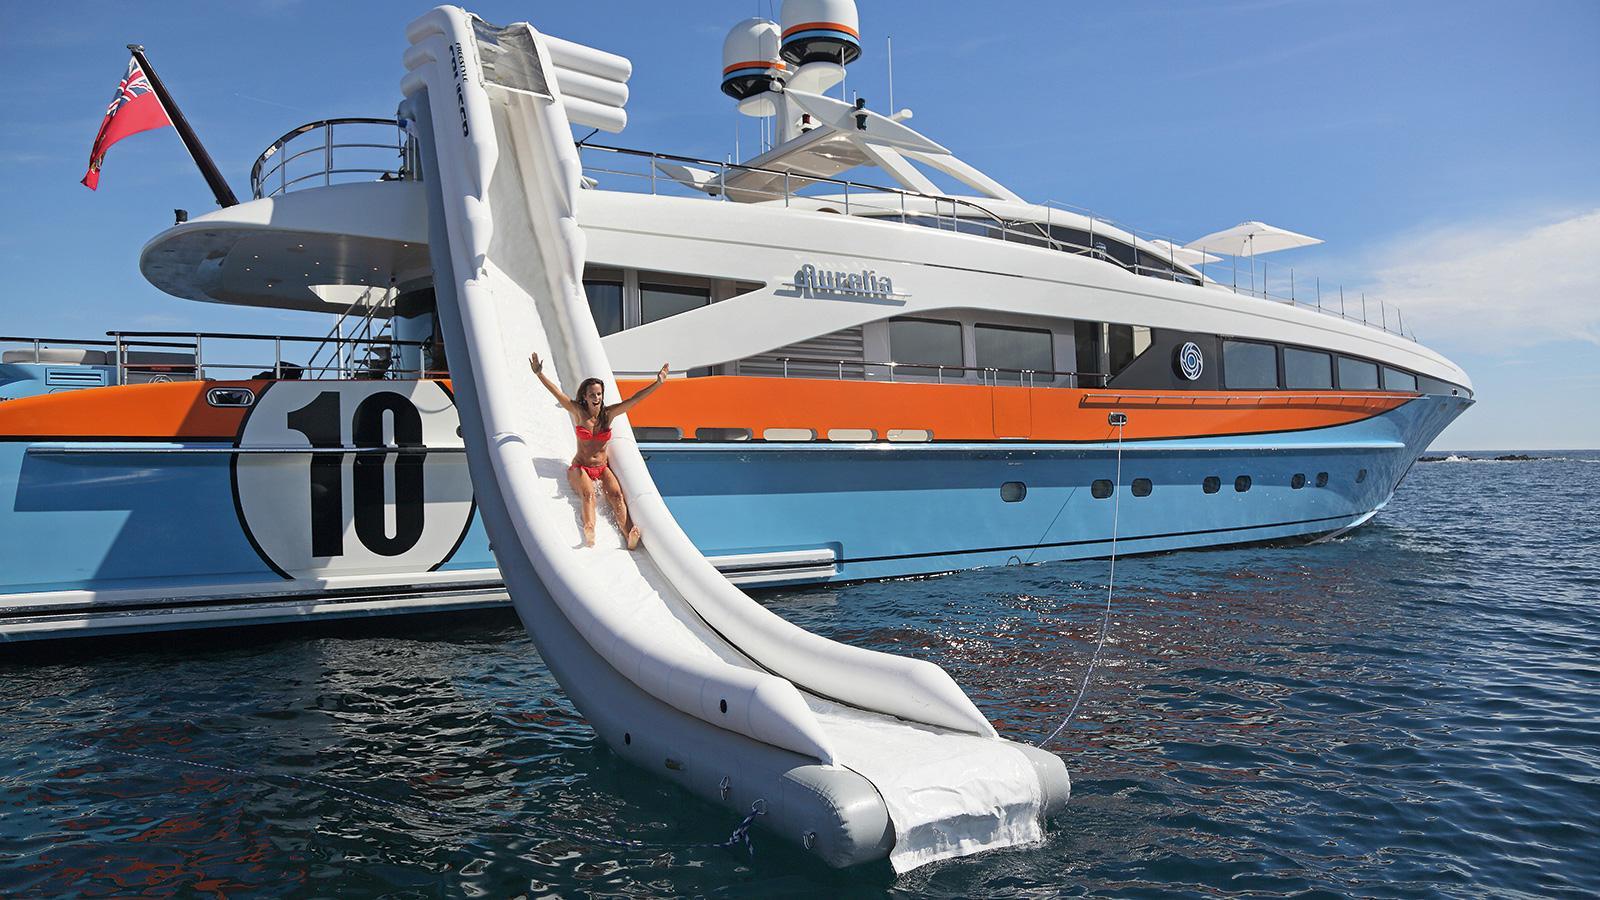 Роскошная супер яхта HEESEN Аурелия на Лазурном Берегу